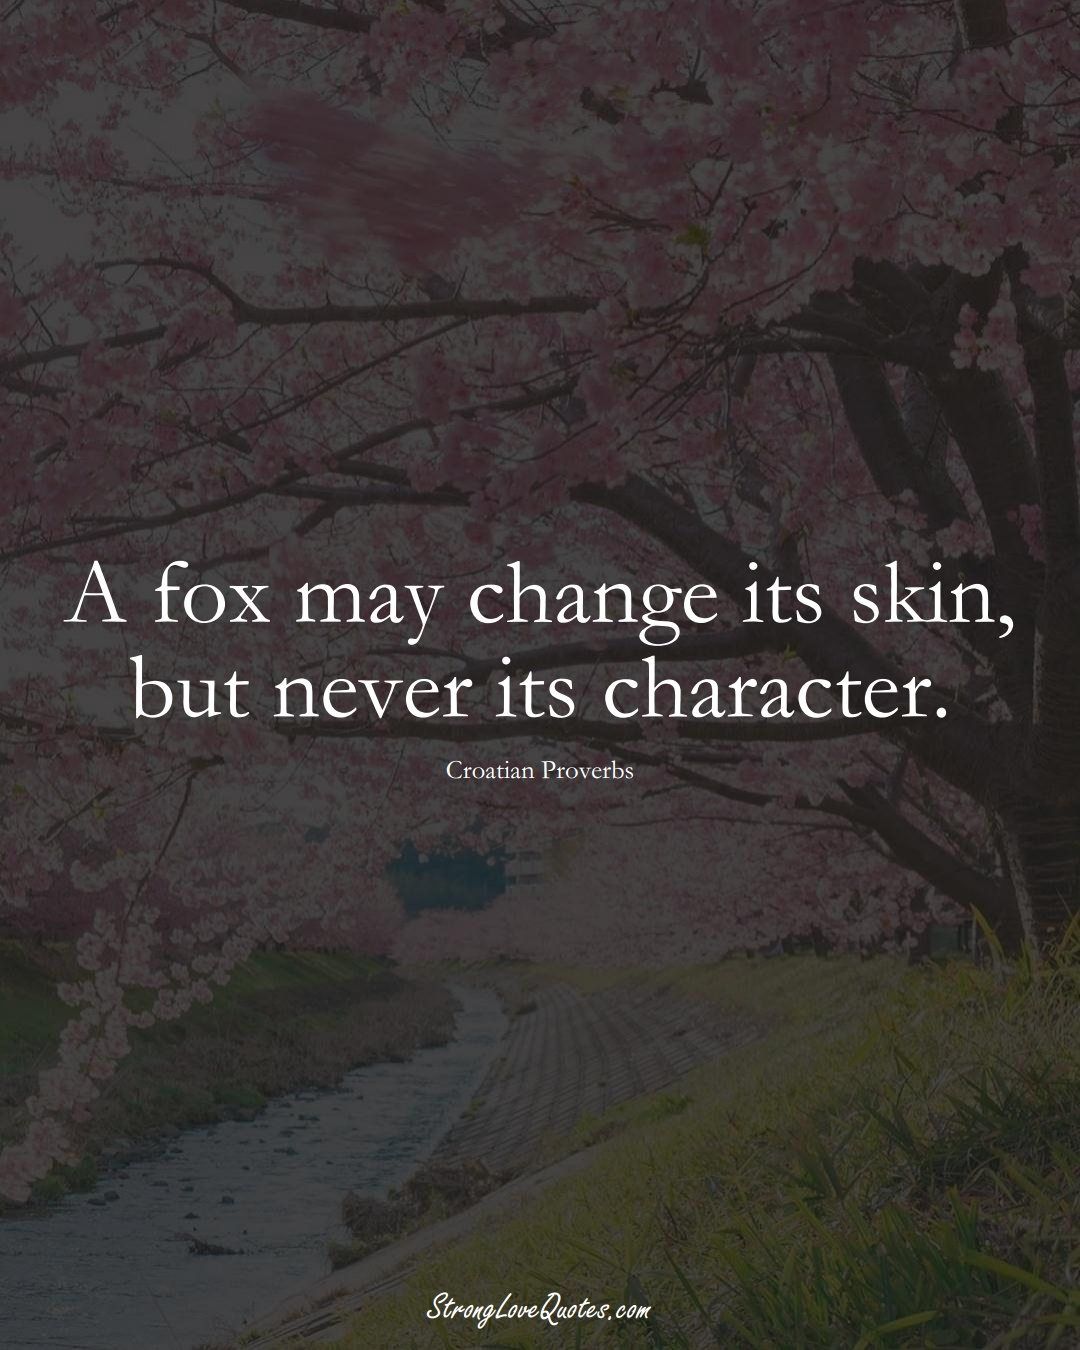 A fox may change its skin, but never its character. (Croatian Sayings);  #EuropeanSayings